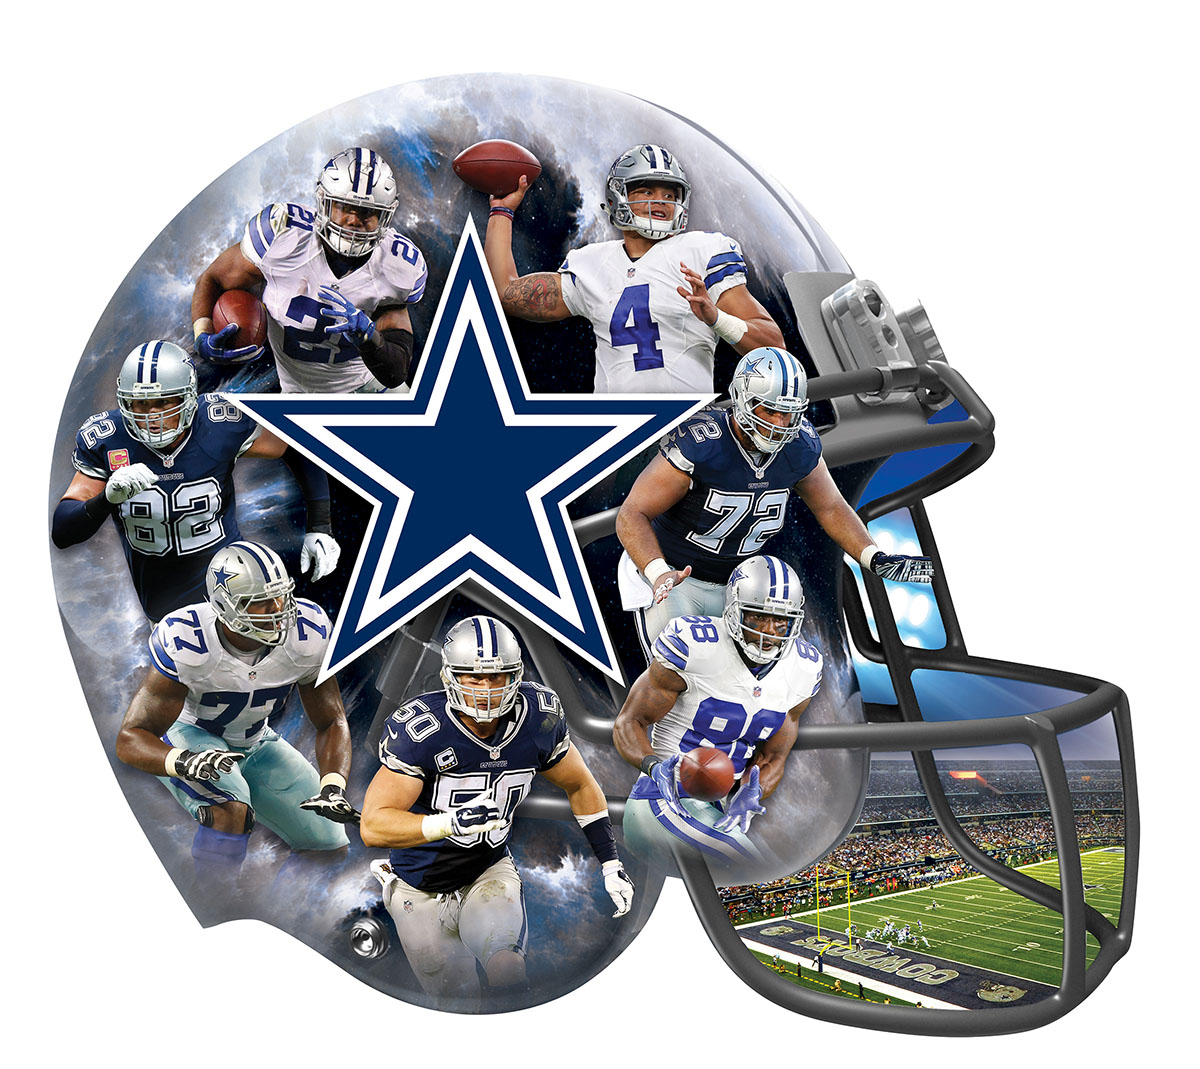 Dallas Cowboys Football Shaped Puzzle